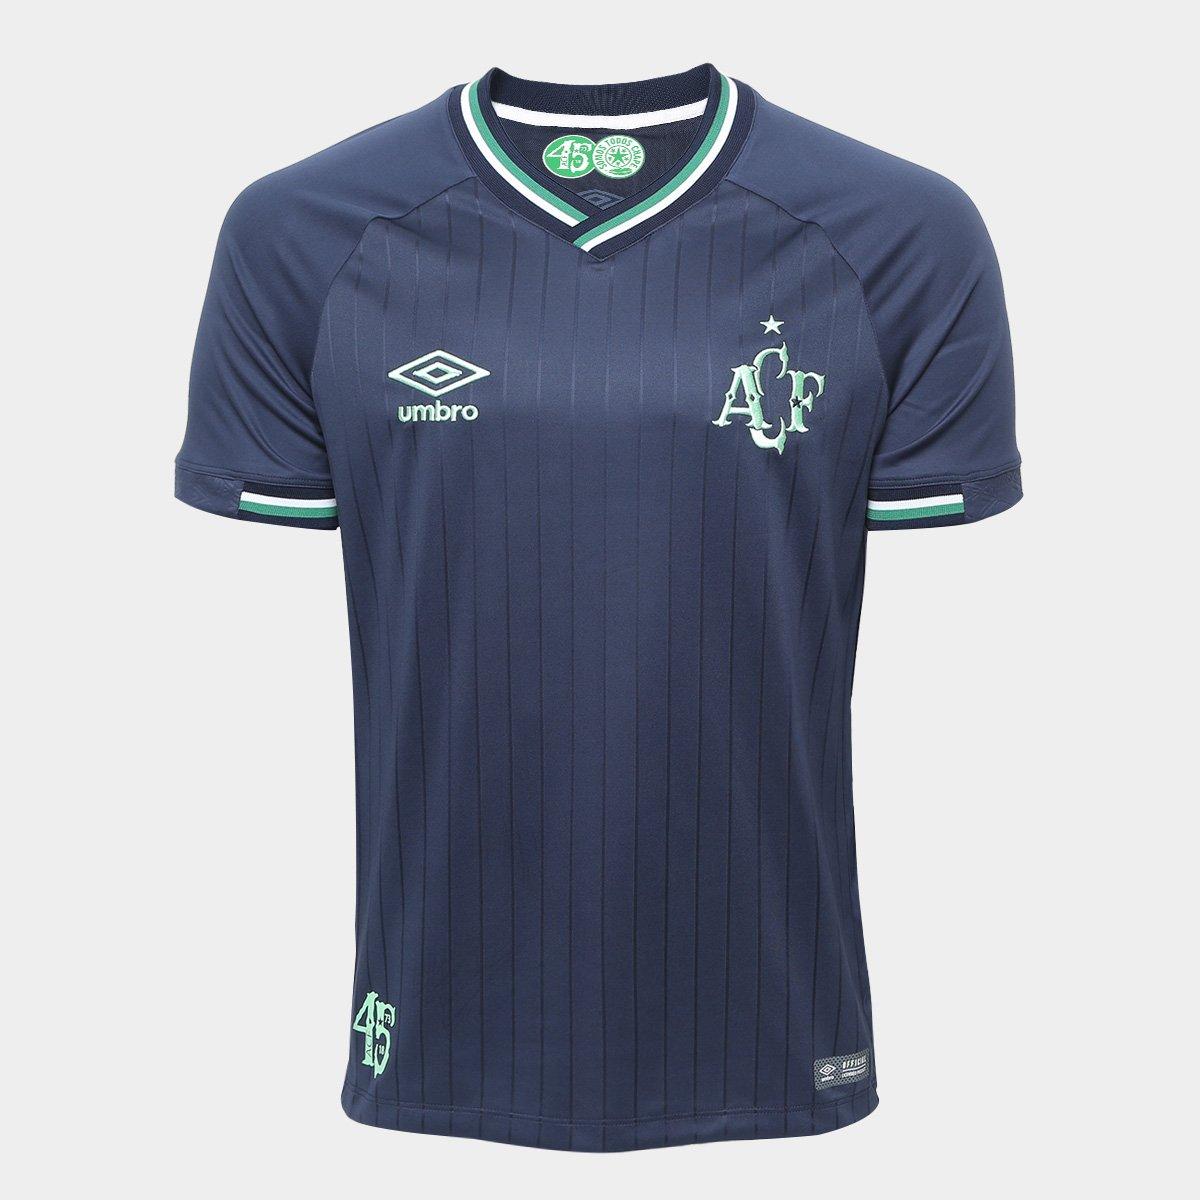 638d2fac7c Camisa Chapecoense III 2018 s n° Torcedor Umbro Masculina - Marinho e Verde  - Compre Agora